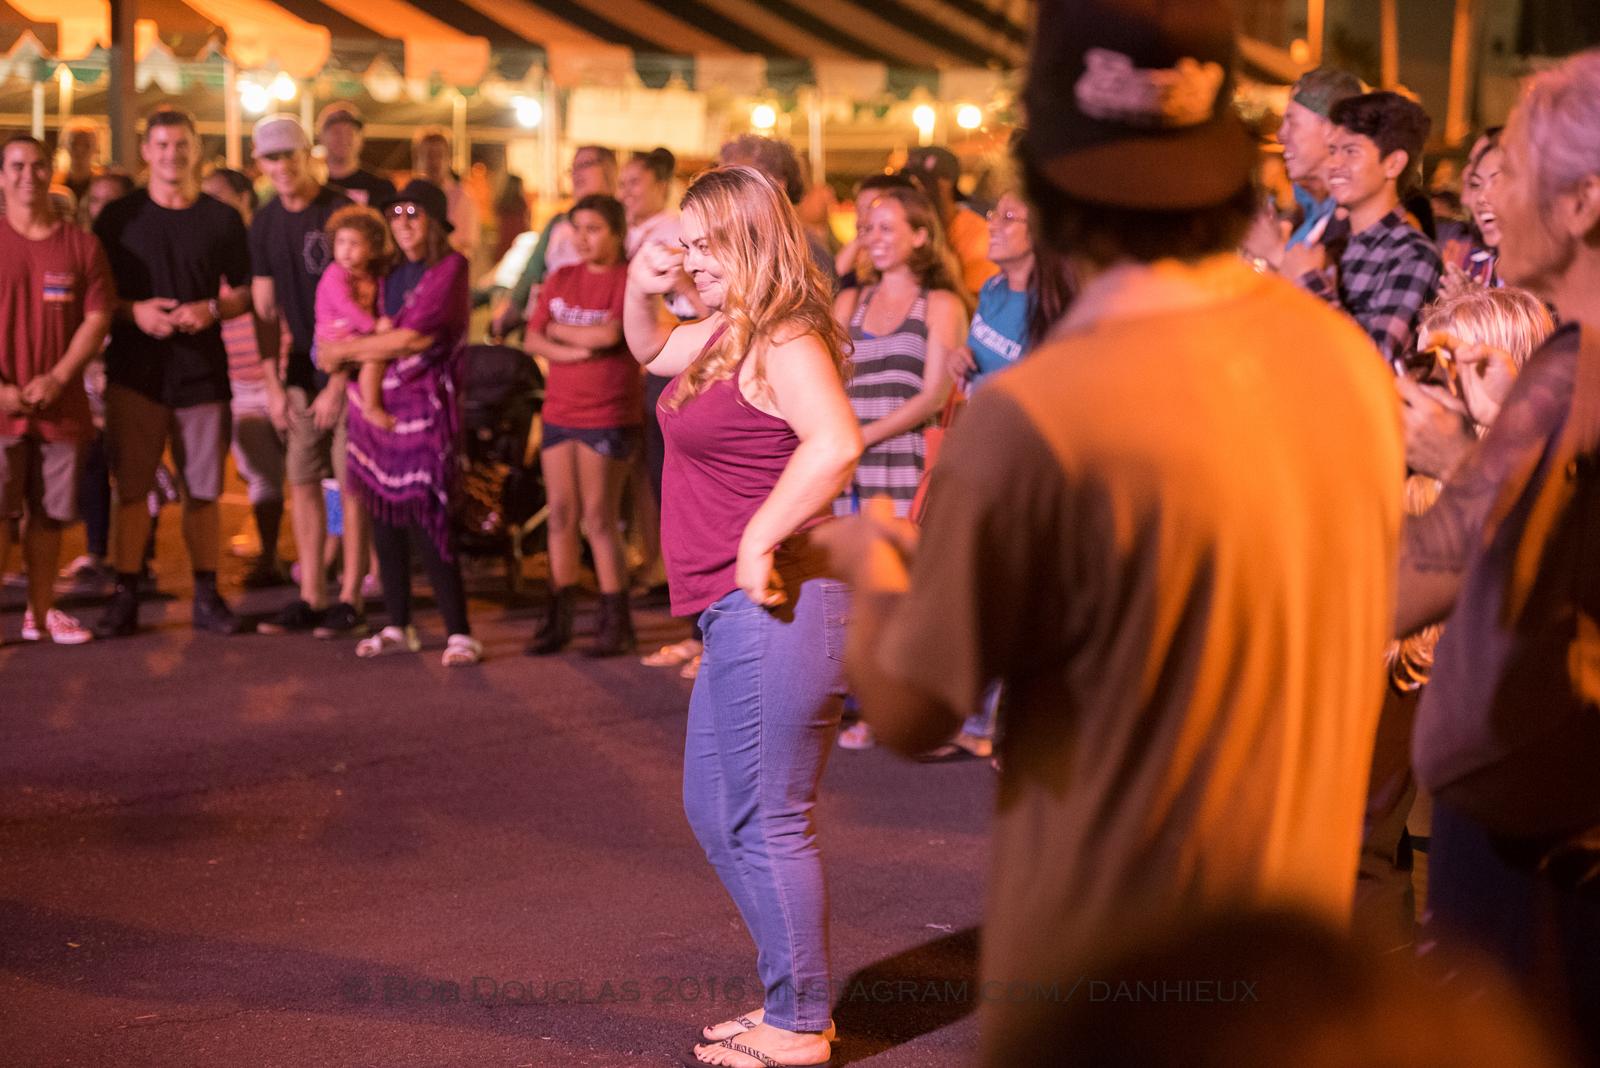 Woman in audience dancing.